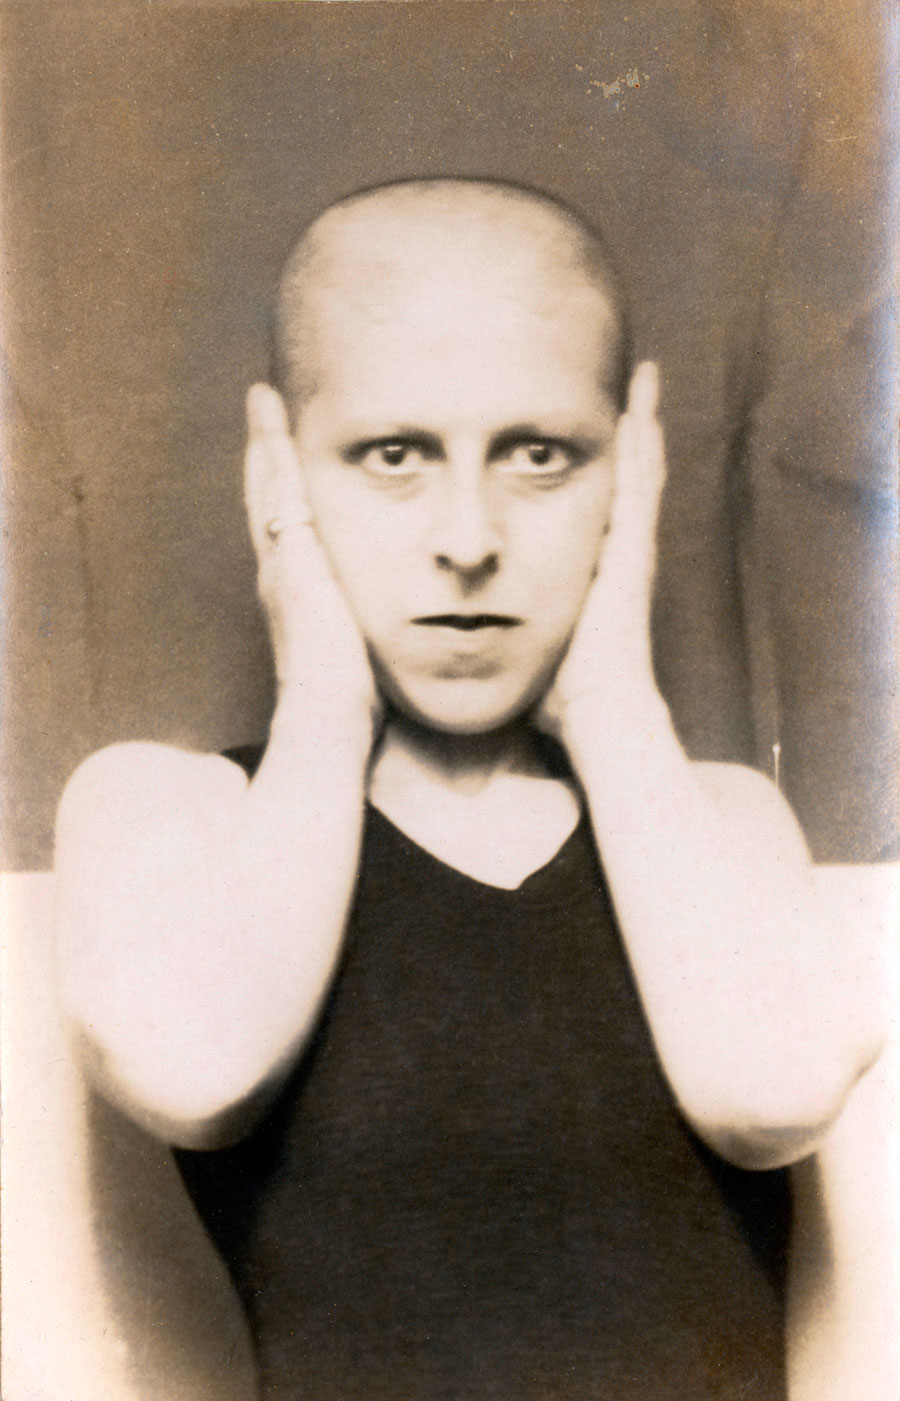 Fotó: Claude Cahun: Autoportrait, 1928 © Jersey Heritage Collection